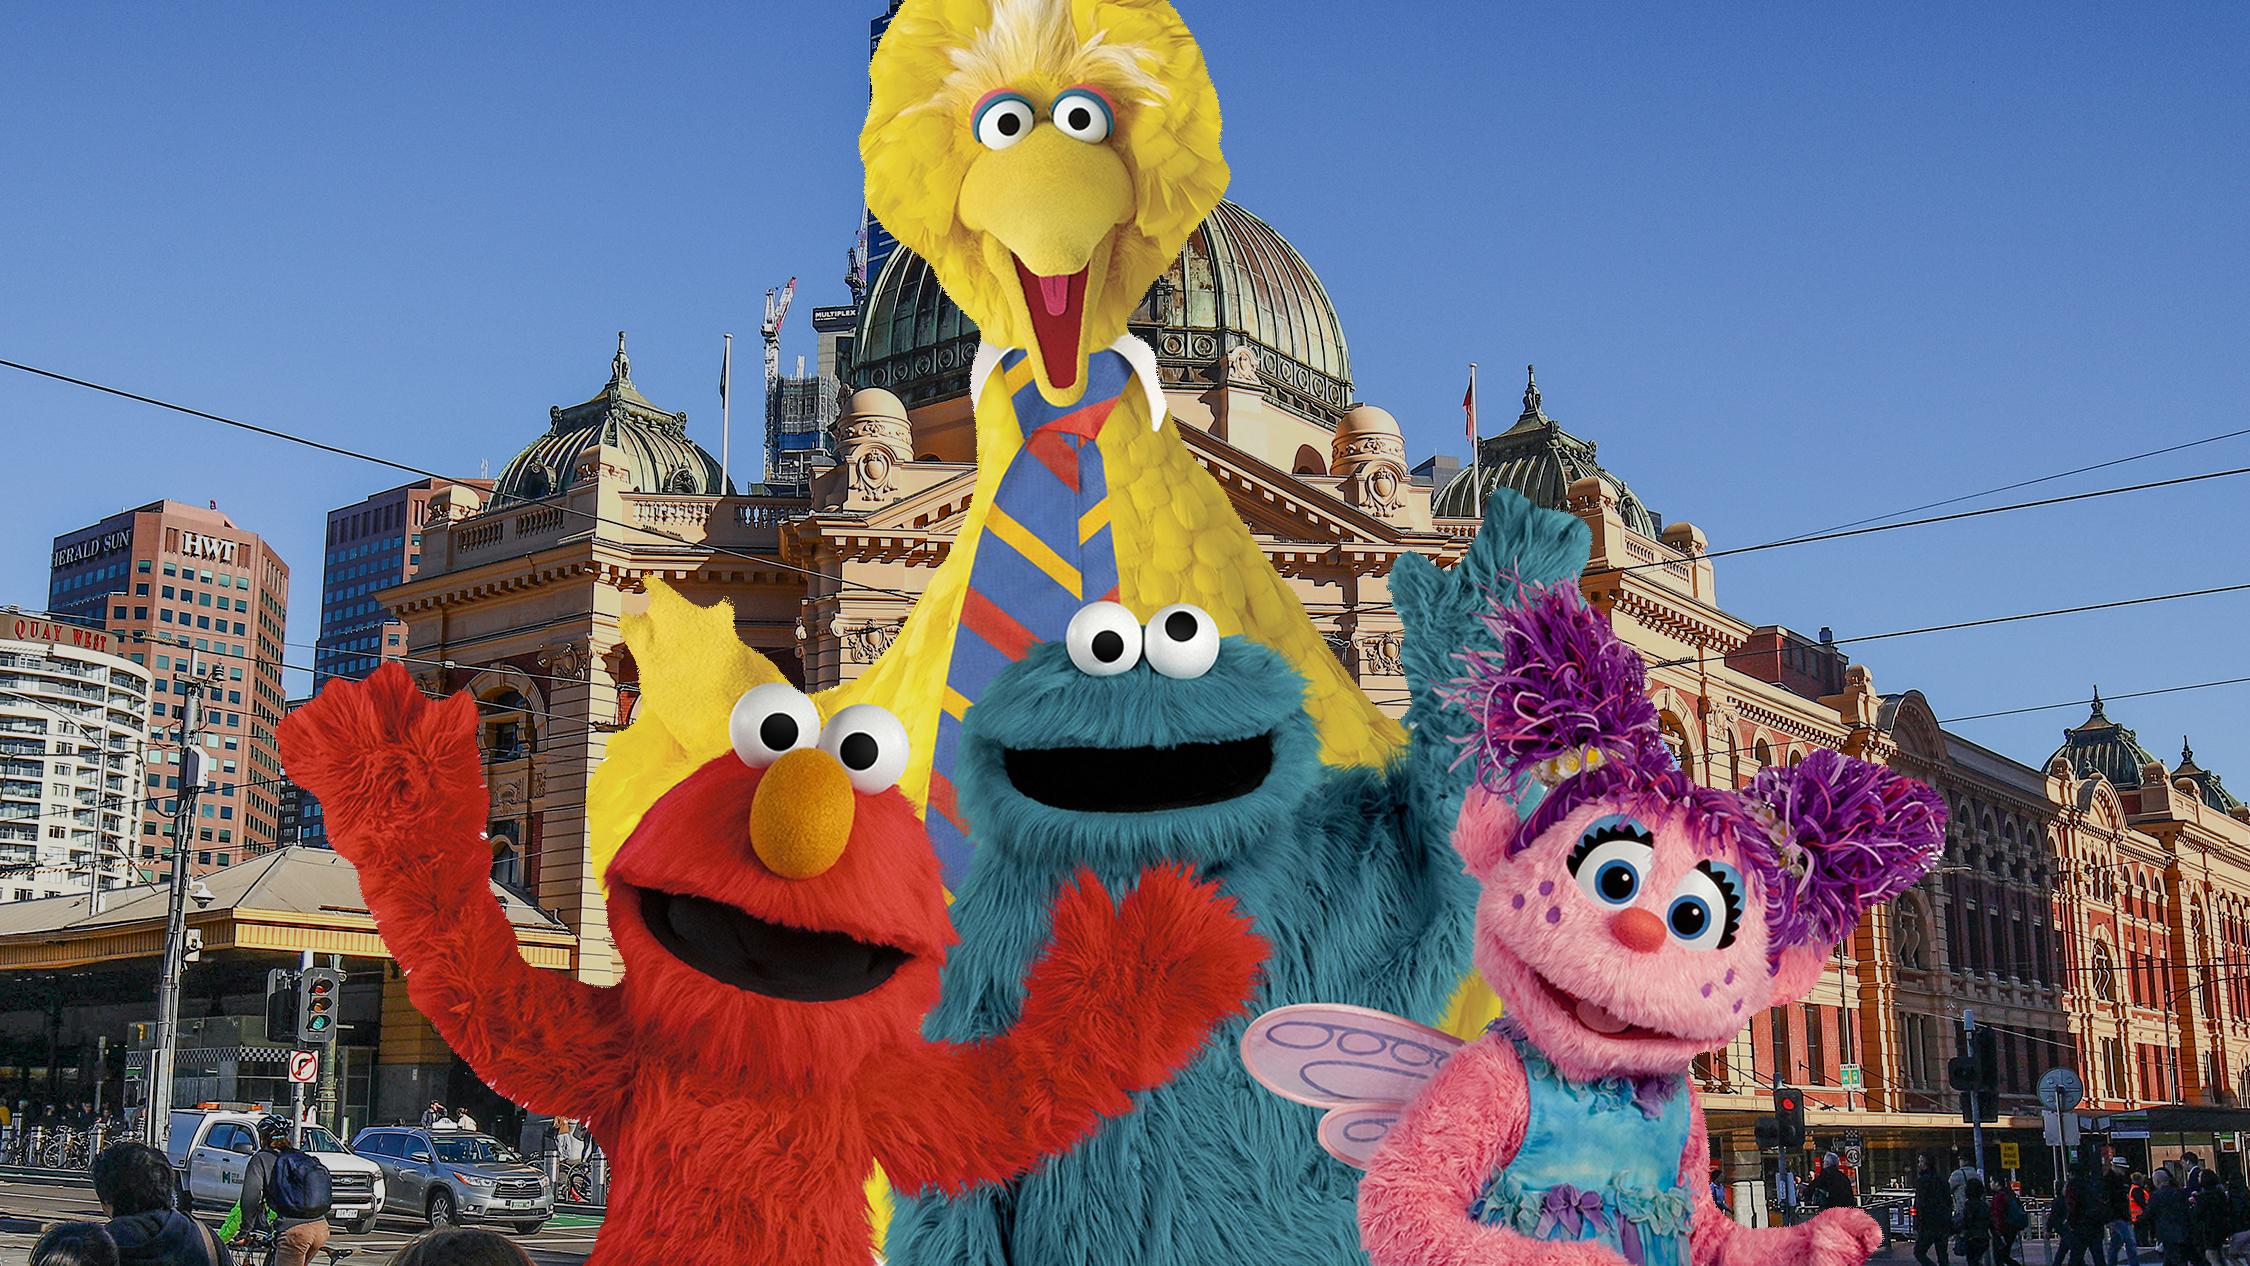 Sesame Street characters in front of Flinders Street Station